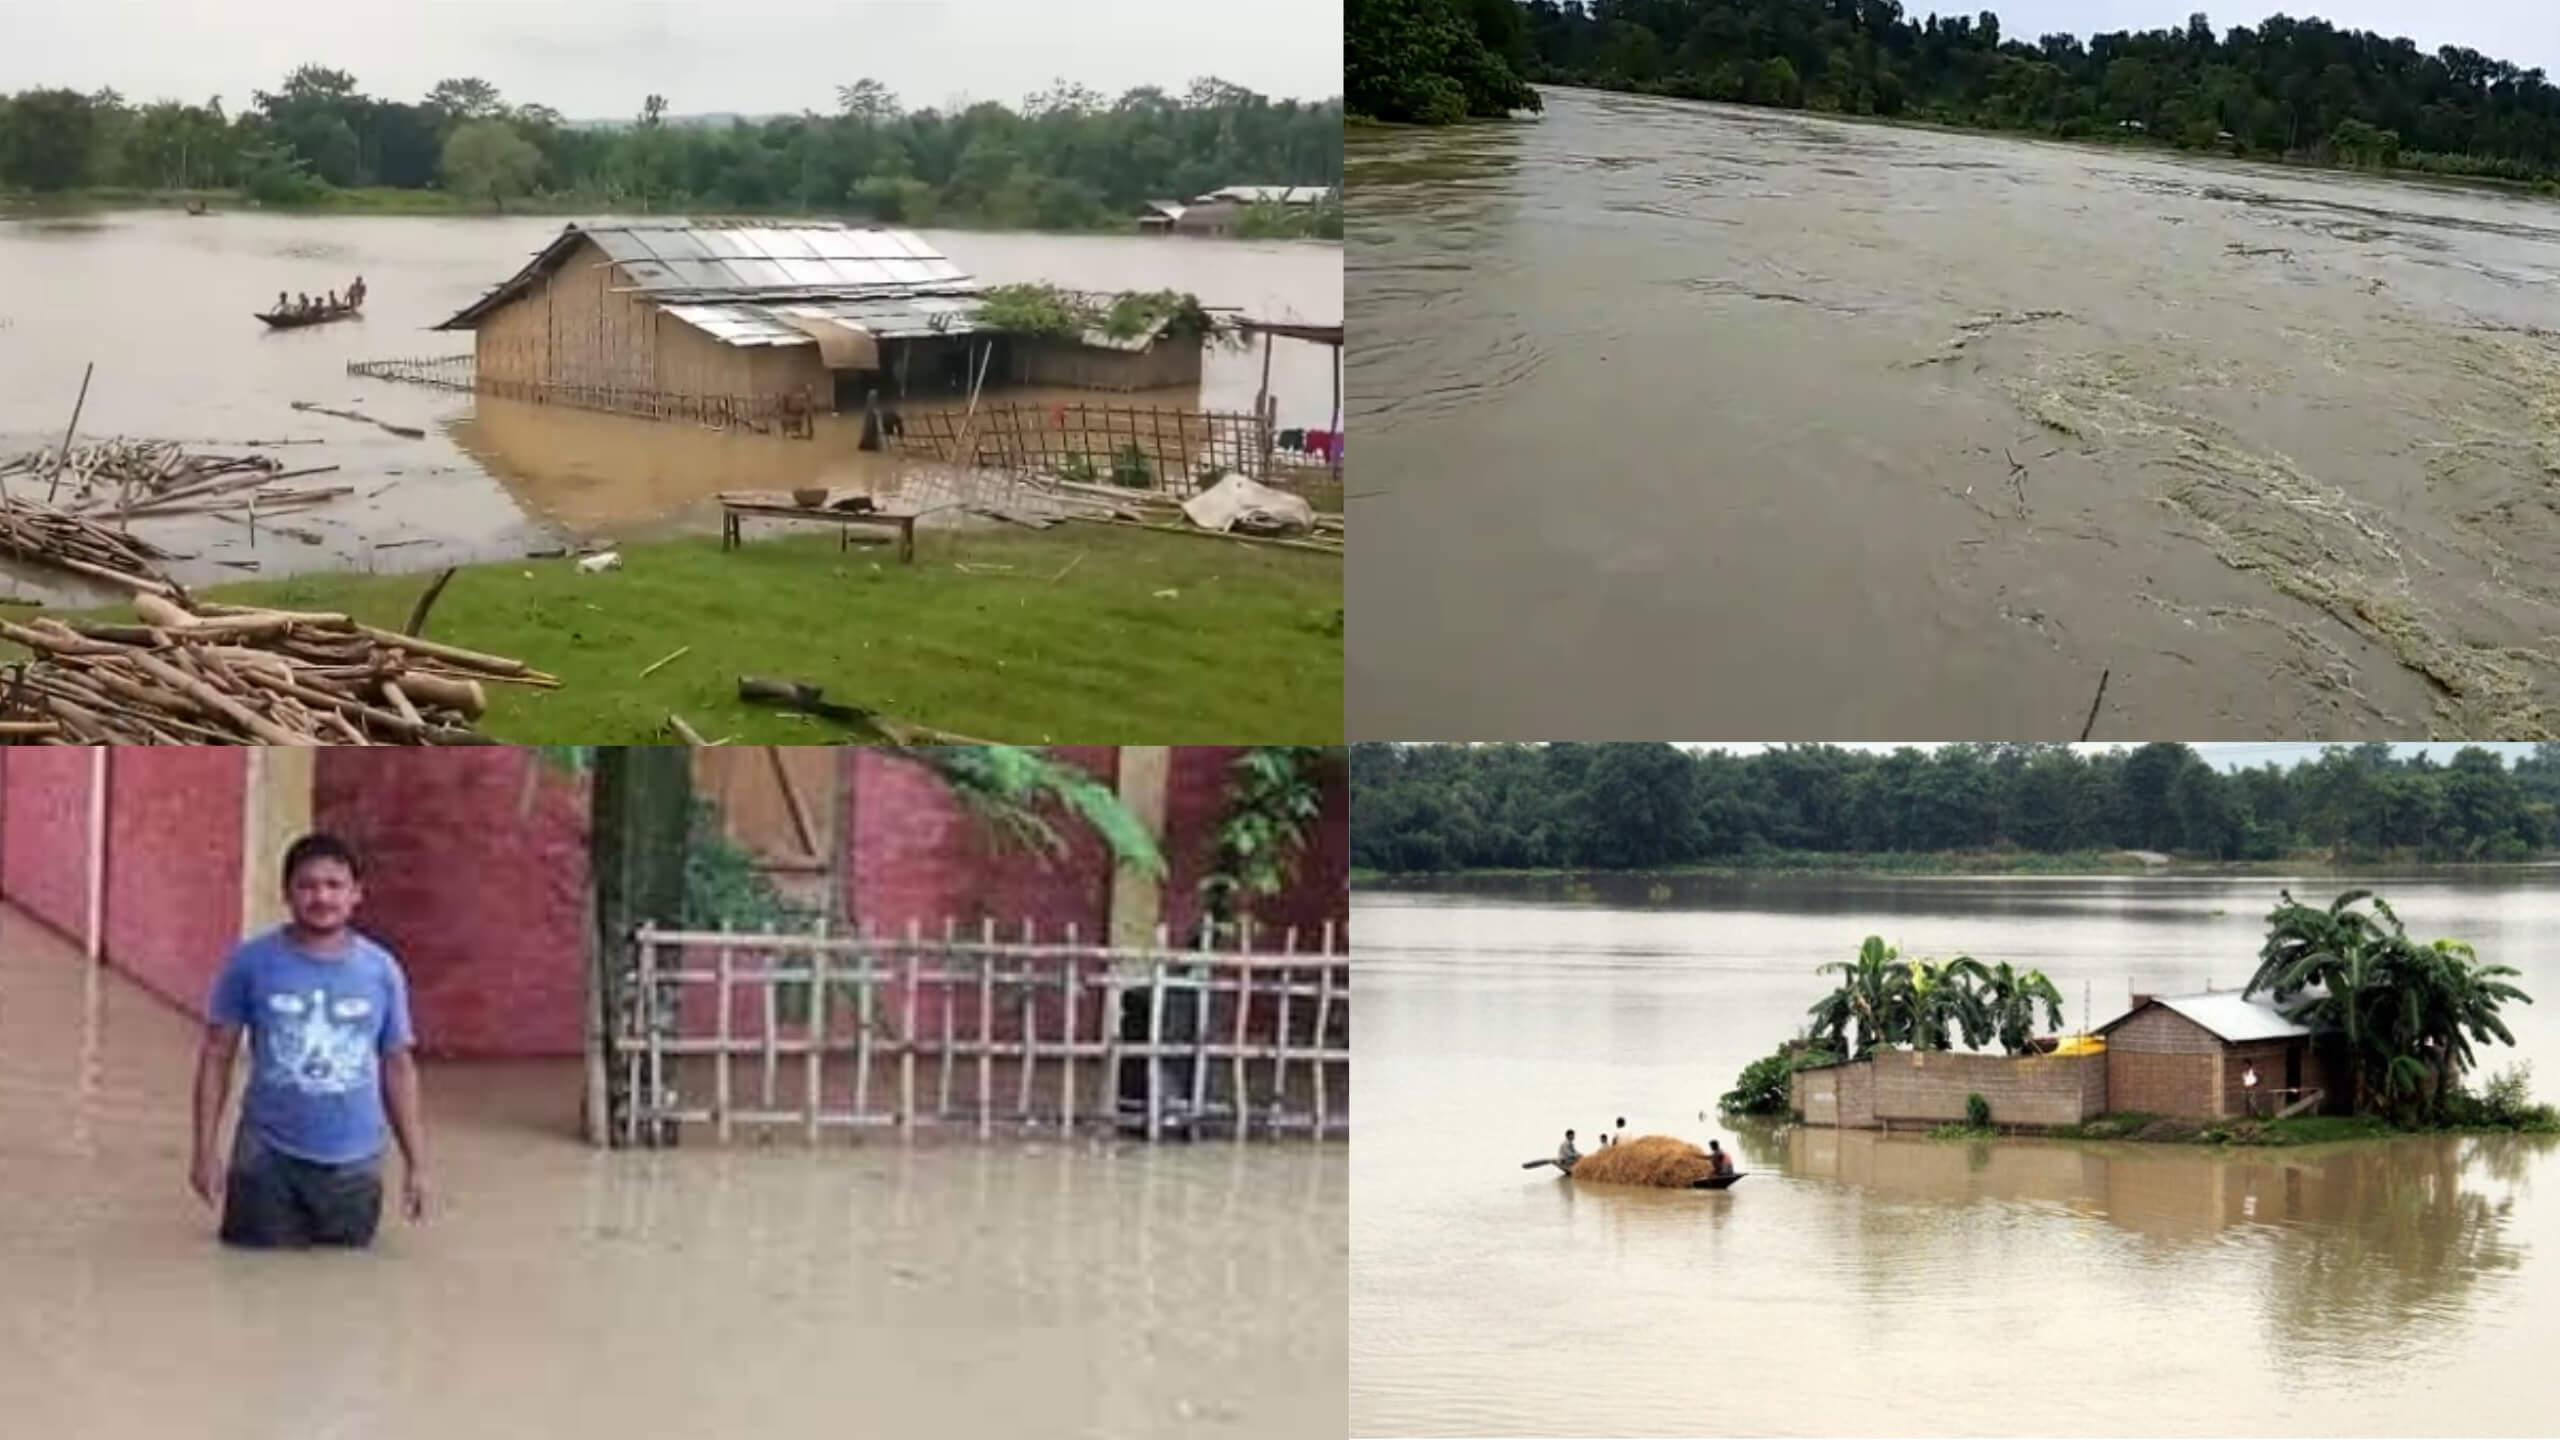 Floods hit Hailakandi district, Tasla embankment breached